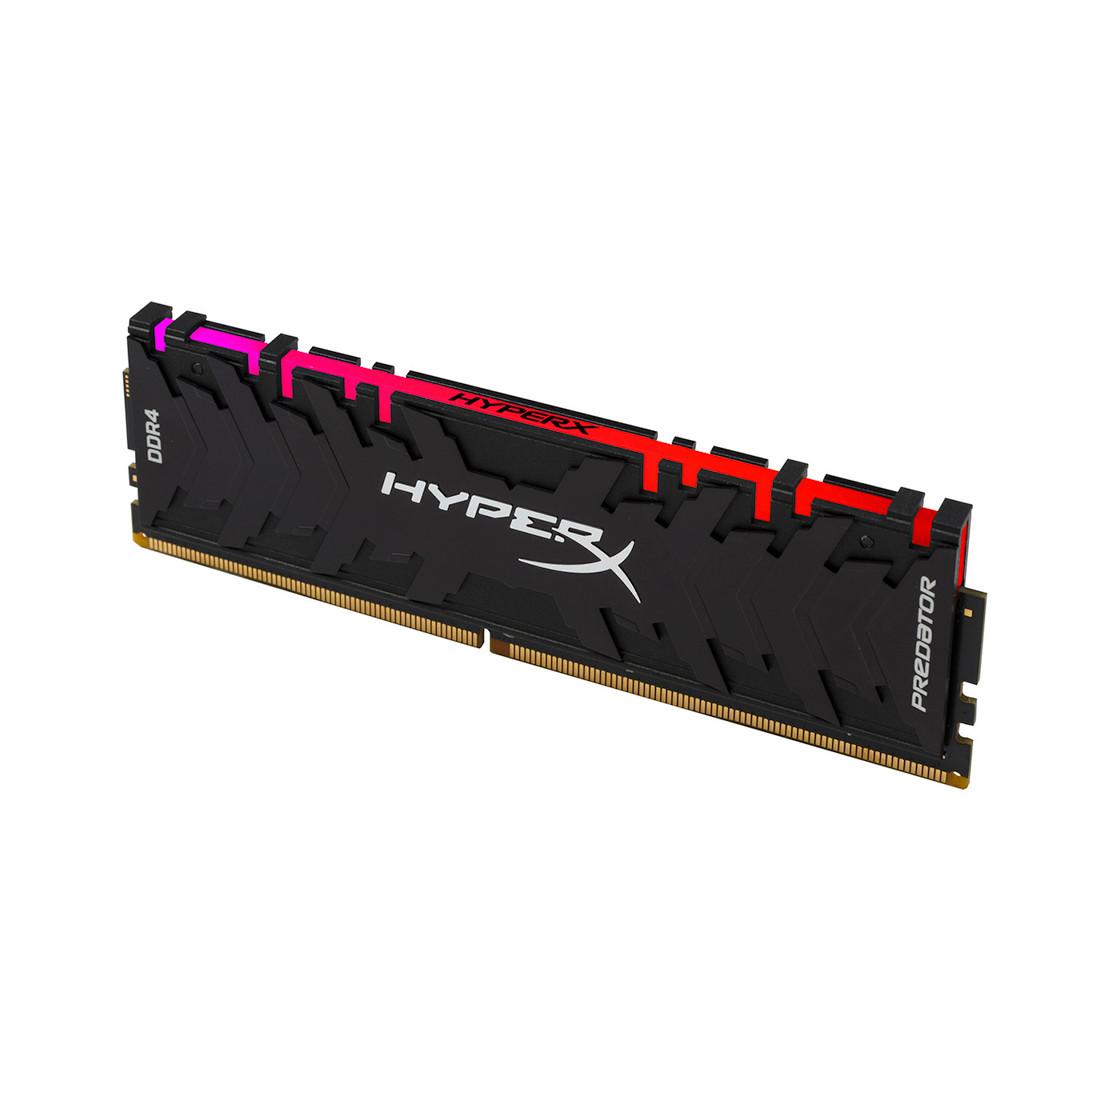 Модуль памяти Kingston HyperX Predator RGB HX432C16PB3A/16 (DDR4, 16GB, DIMM)